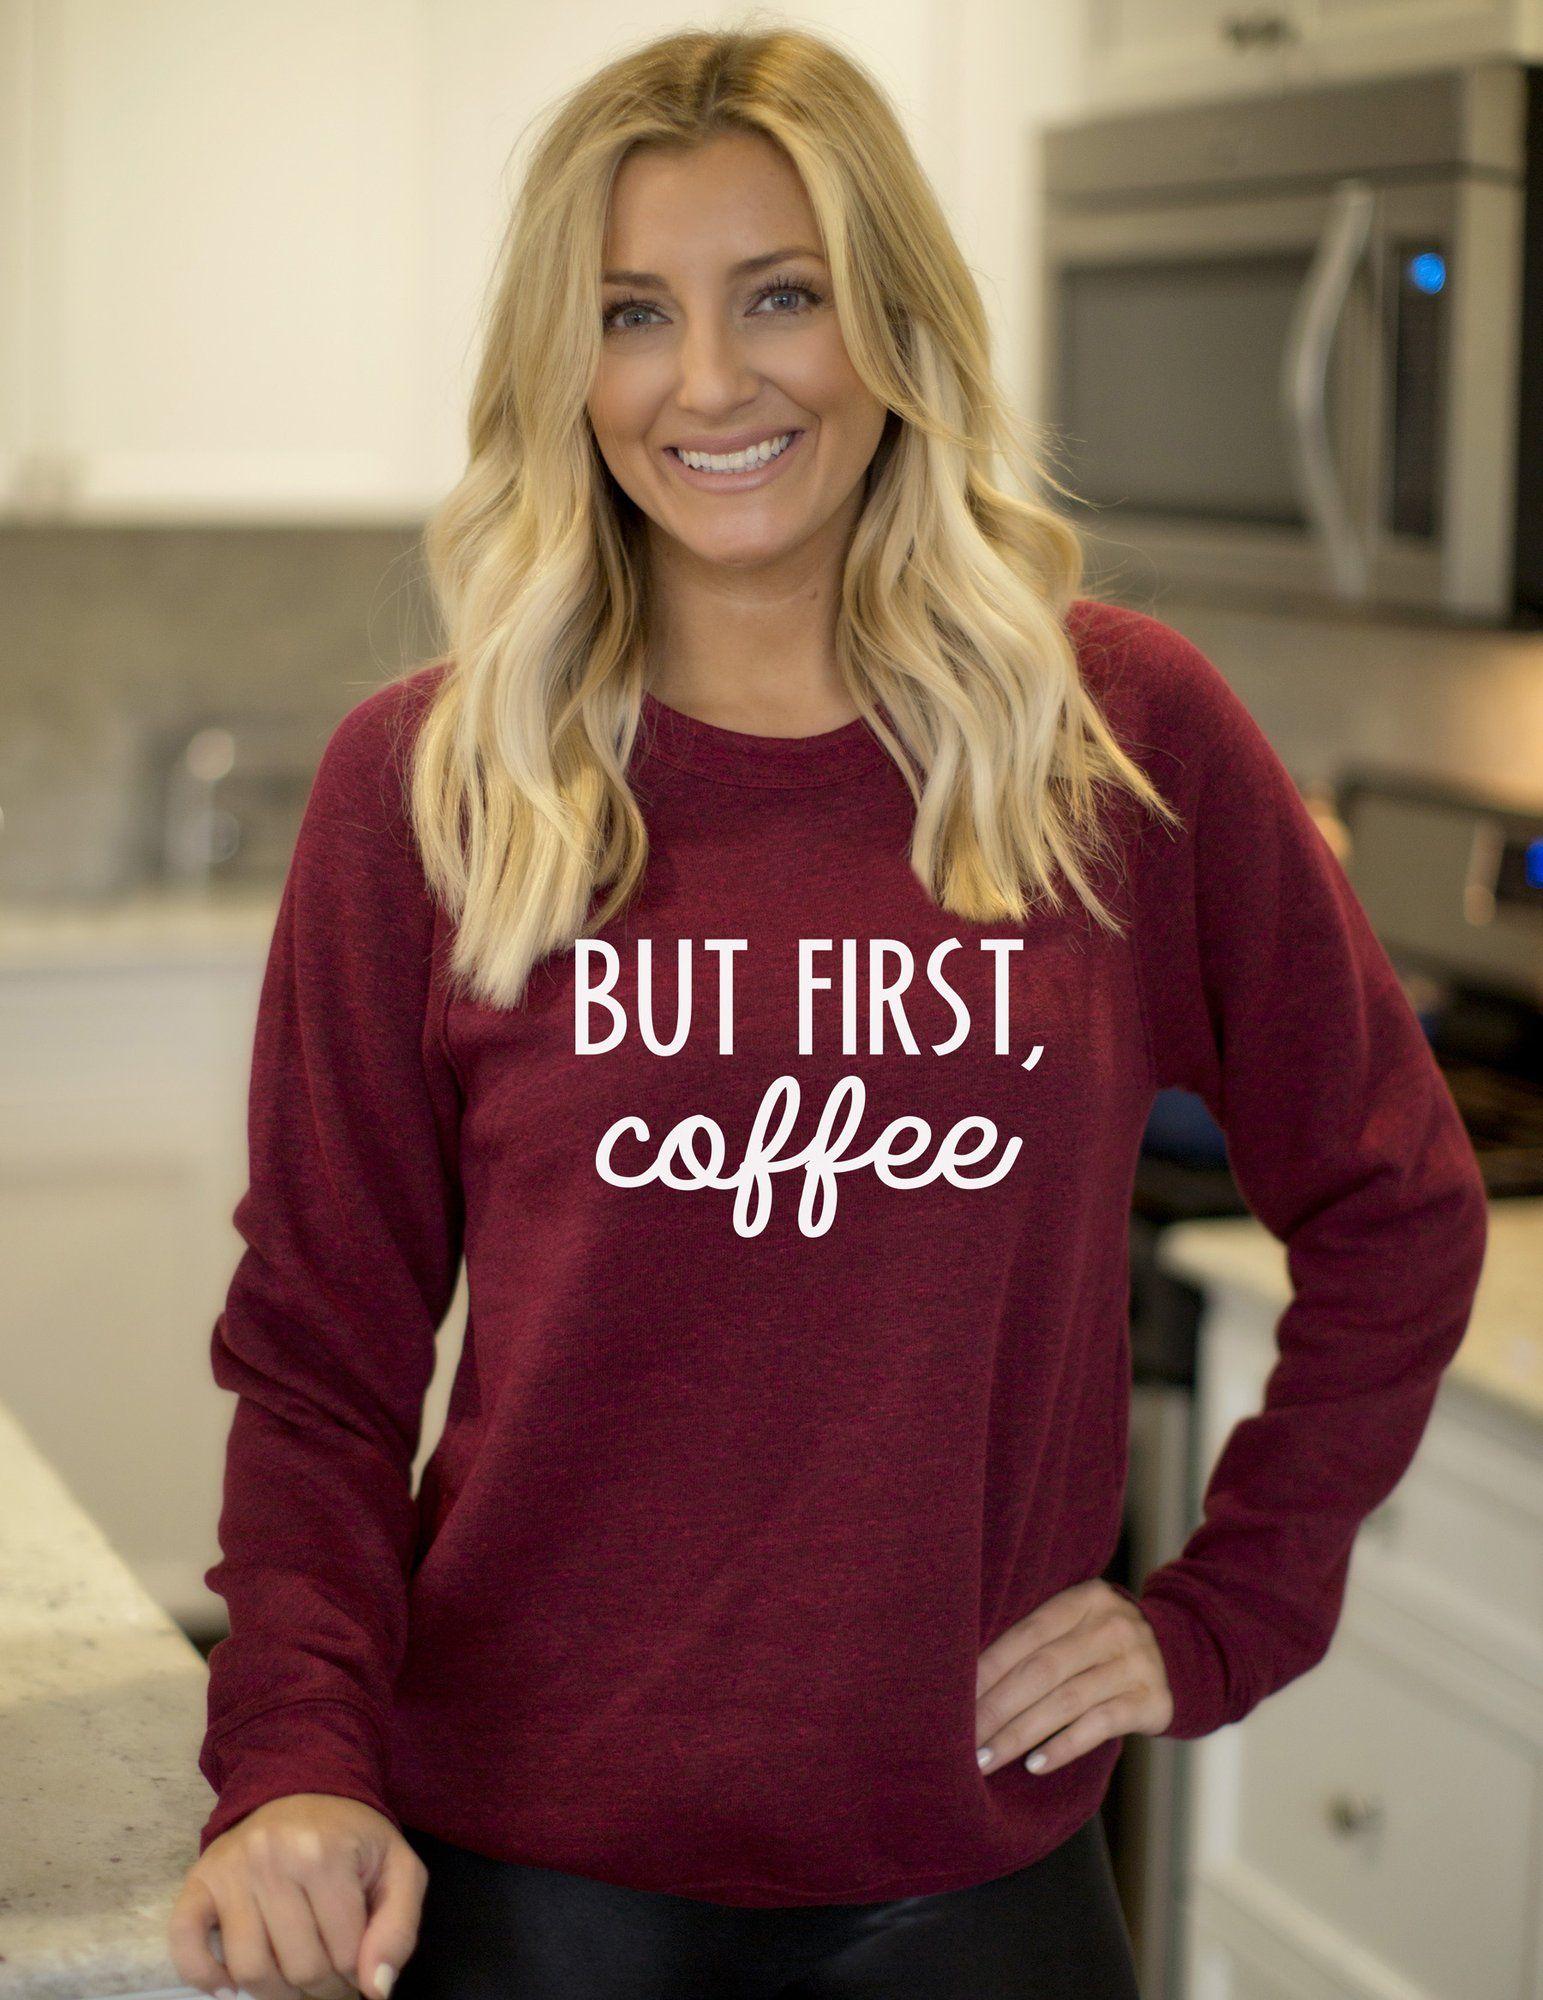 But First Coffee Pullover Sweatshirt Coffee Shirt Starbucks Fleece Sweater Coffee Drinker Coffee Sweashirt Coffee Lover Fleece Sweater Coffee Shirts Unisex Sweatshirt [ 2000 x 1543 Pixel ]